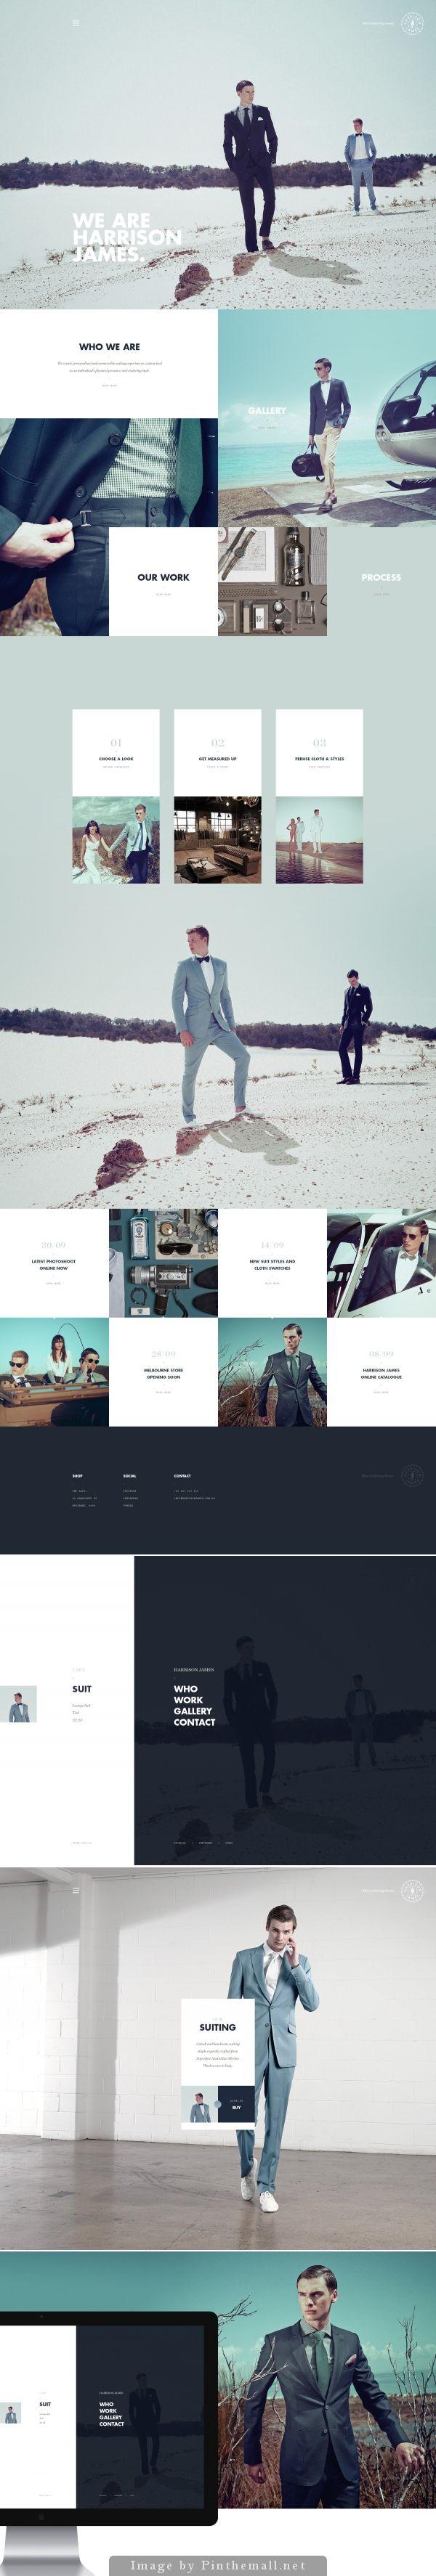 nice design work via TwoFold